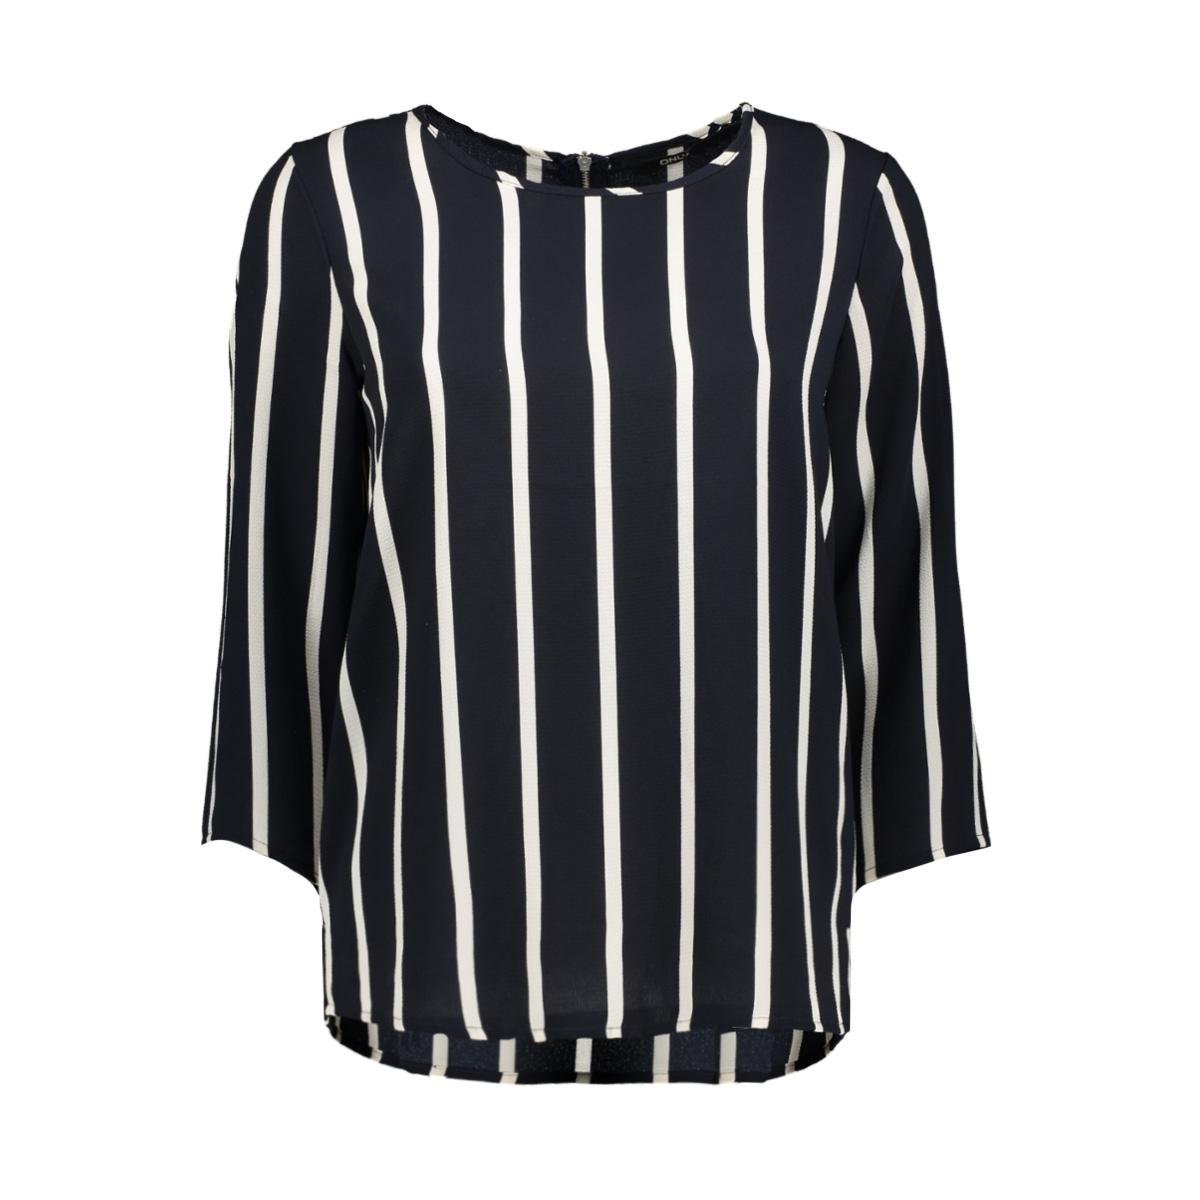 onlnova lux 3/4 sleeve top aop 4 wv 15172743 only t-shirt night sky/aida 20 s